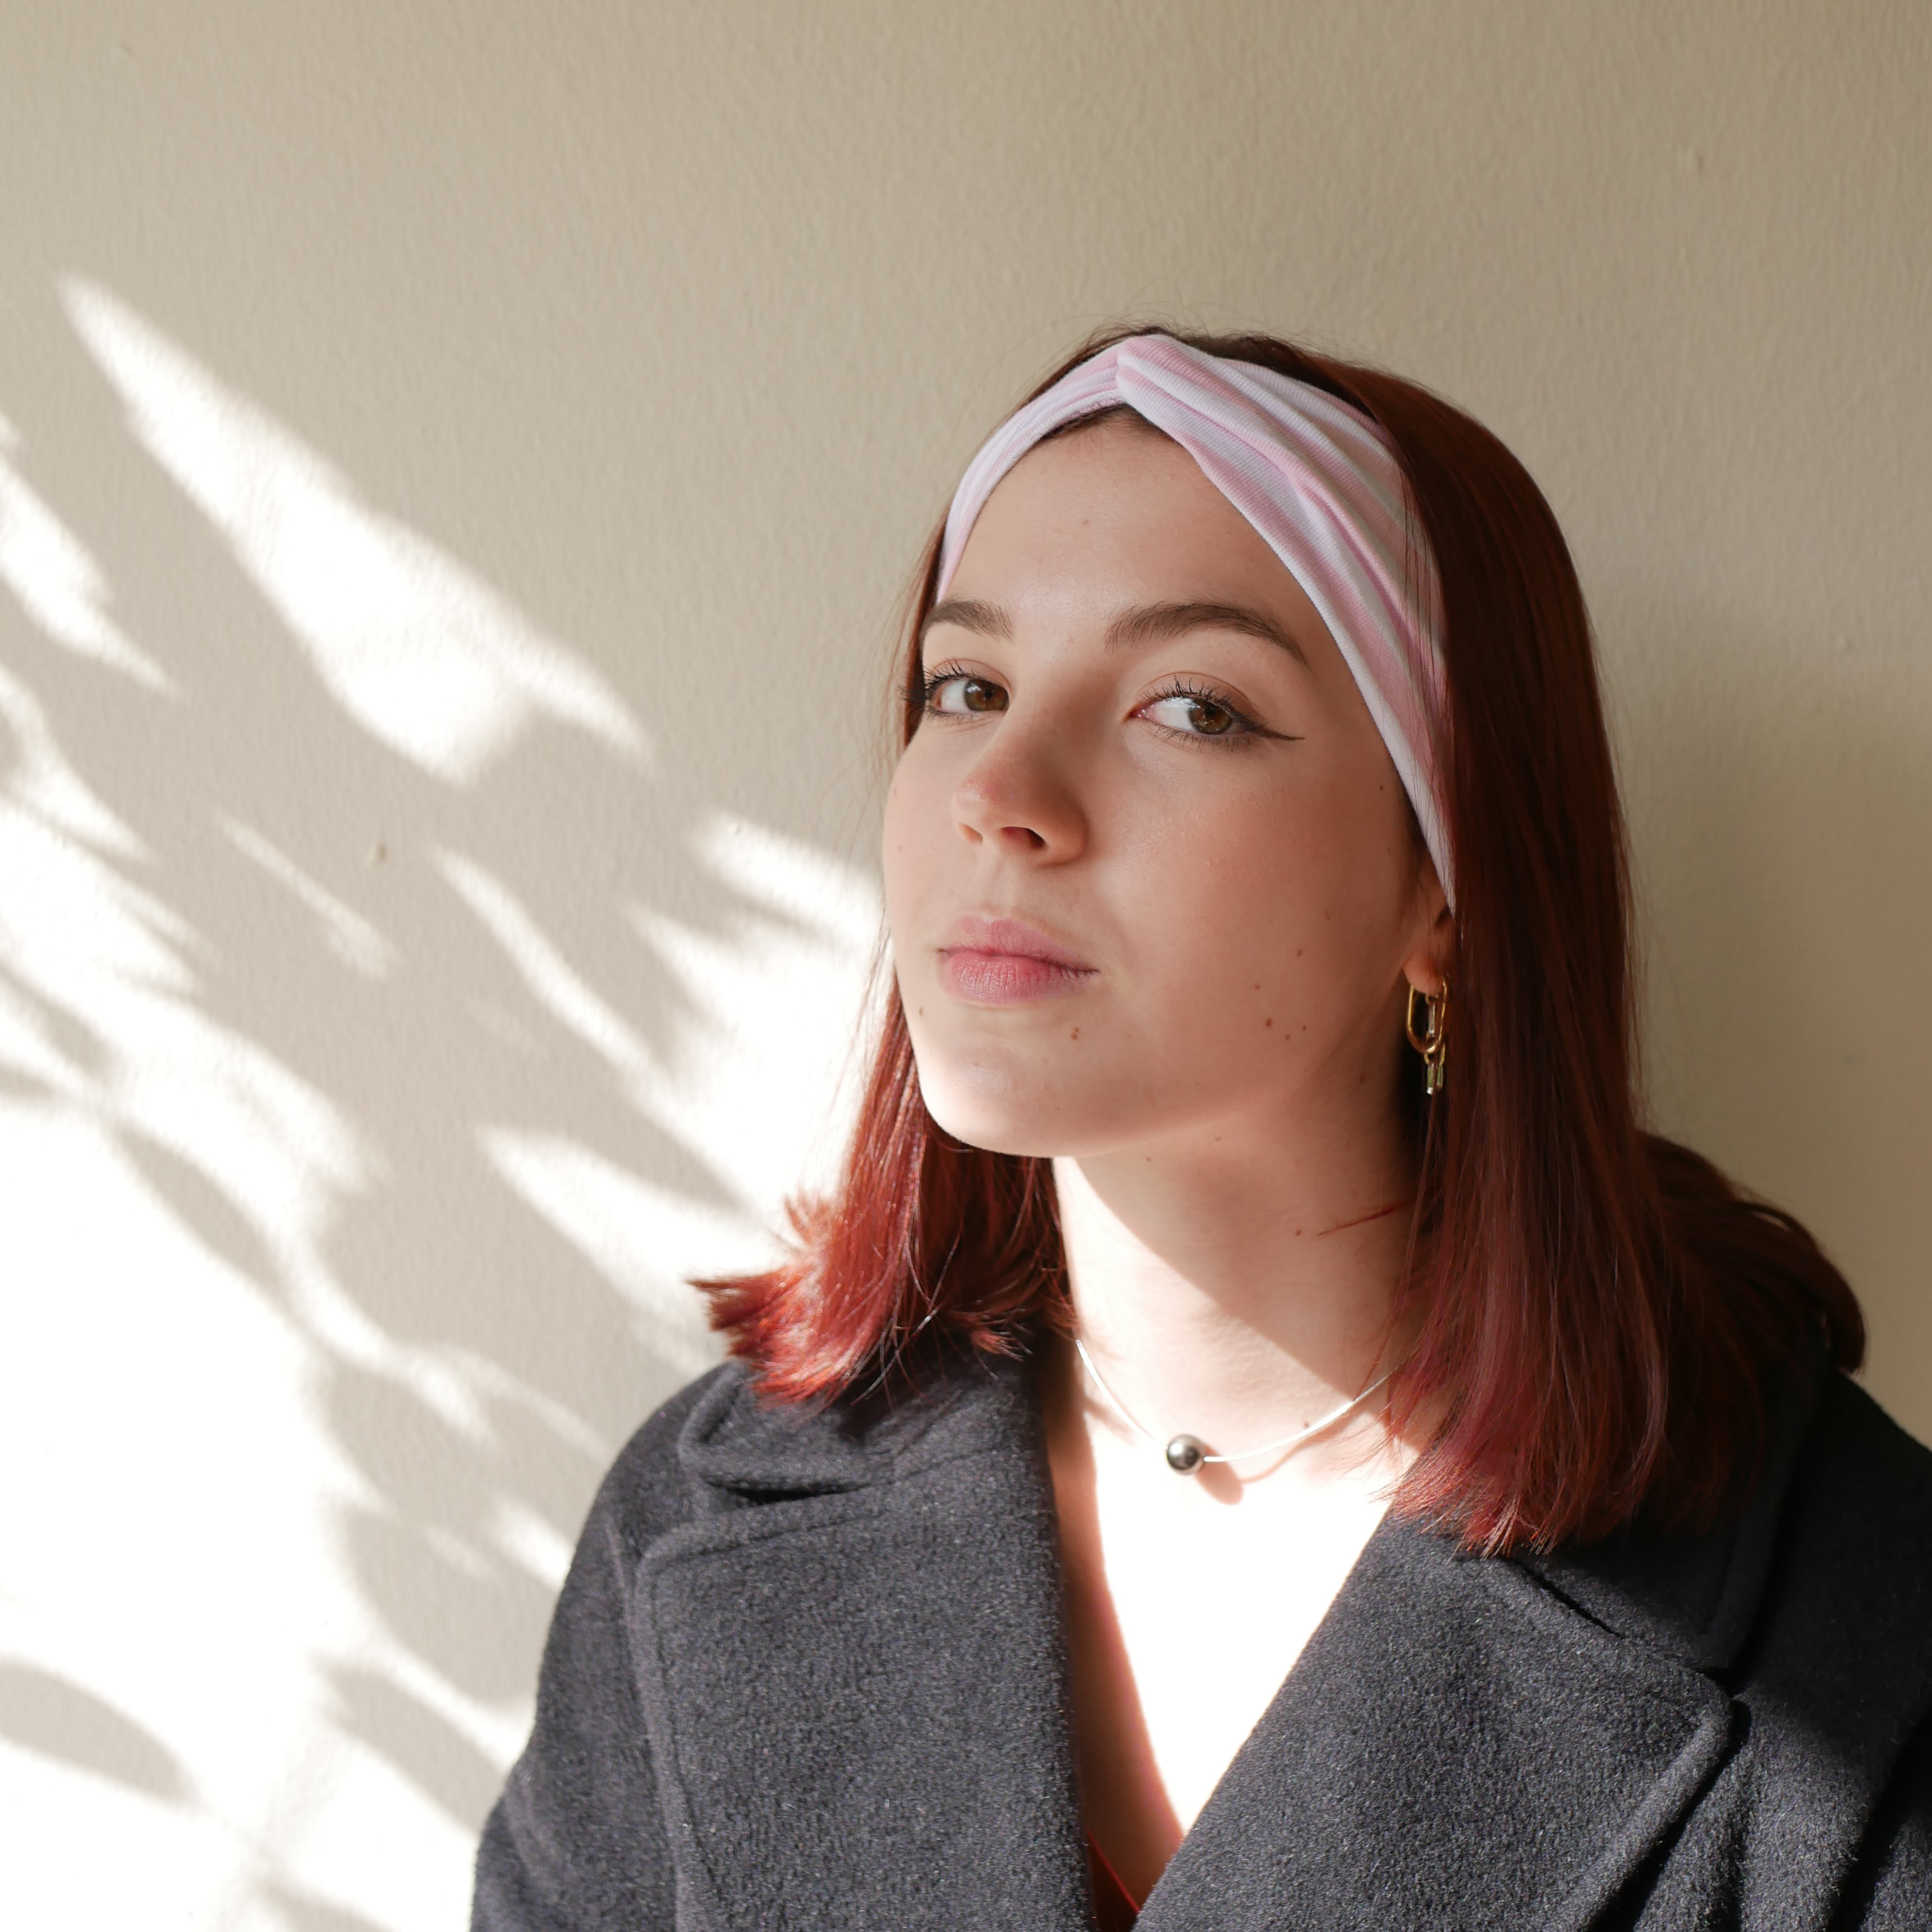 Pink and white Turban headband, wide headband, fifties headband, yoga headband, lolita headband